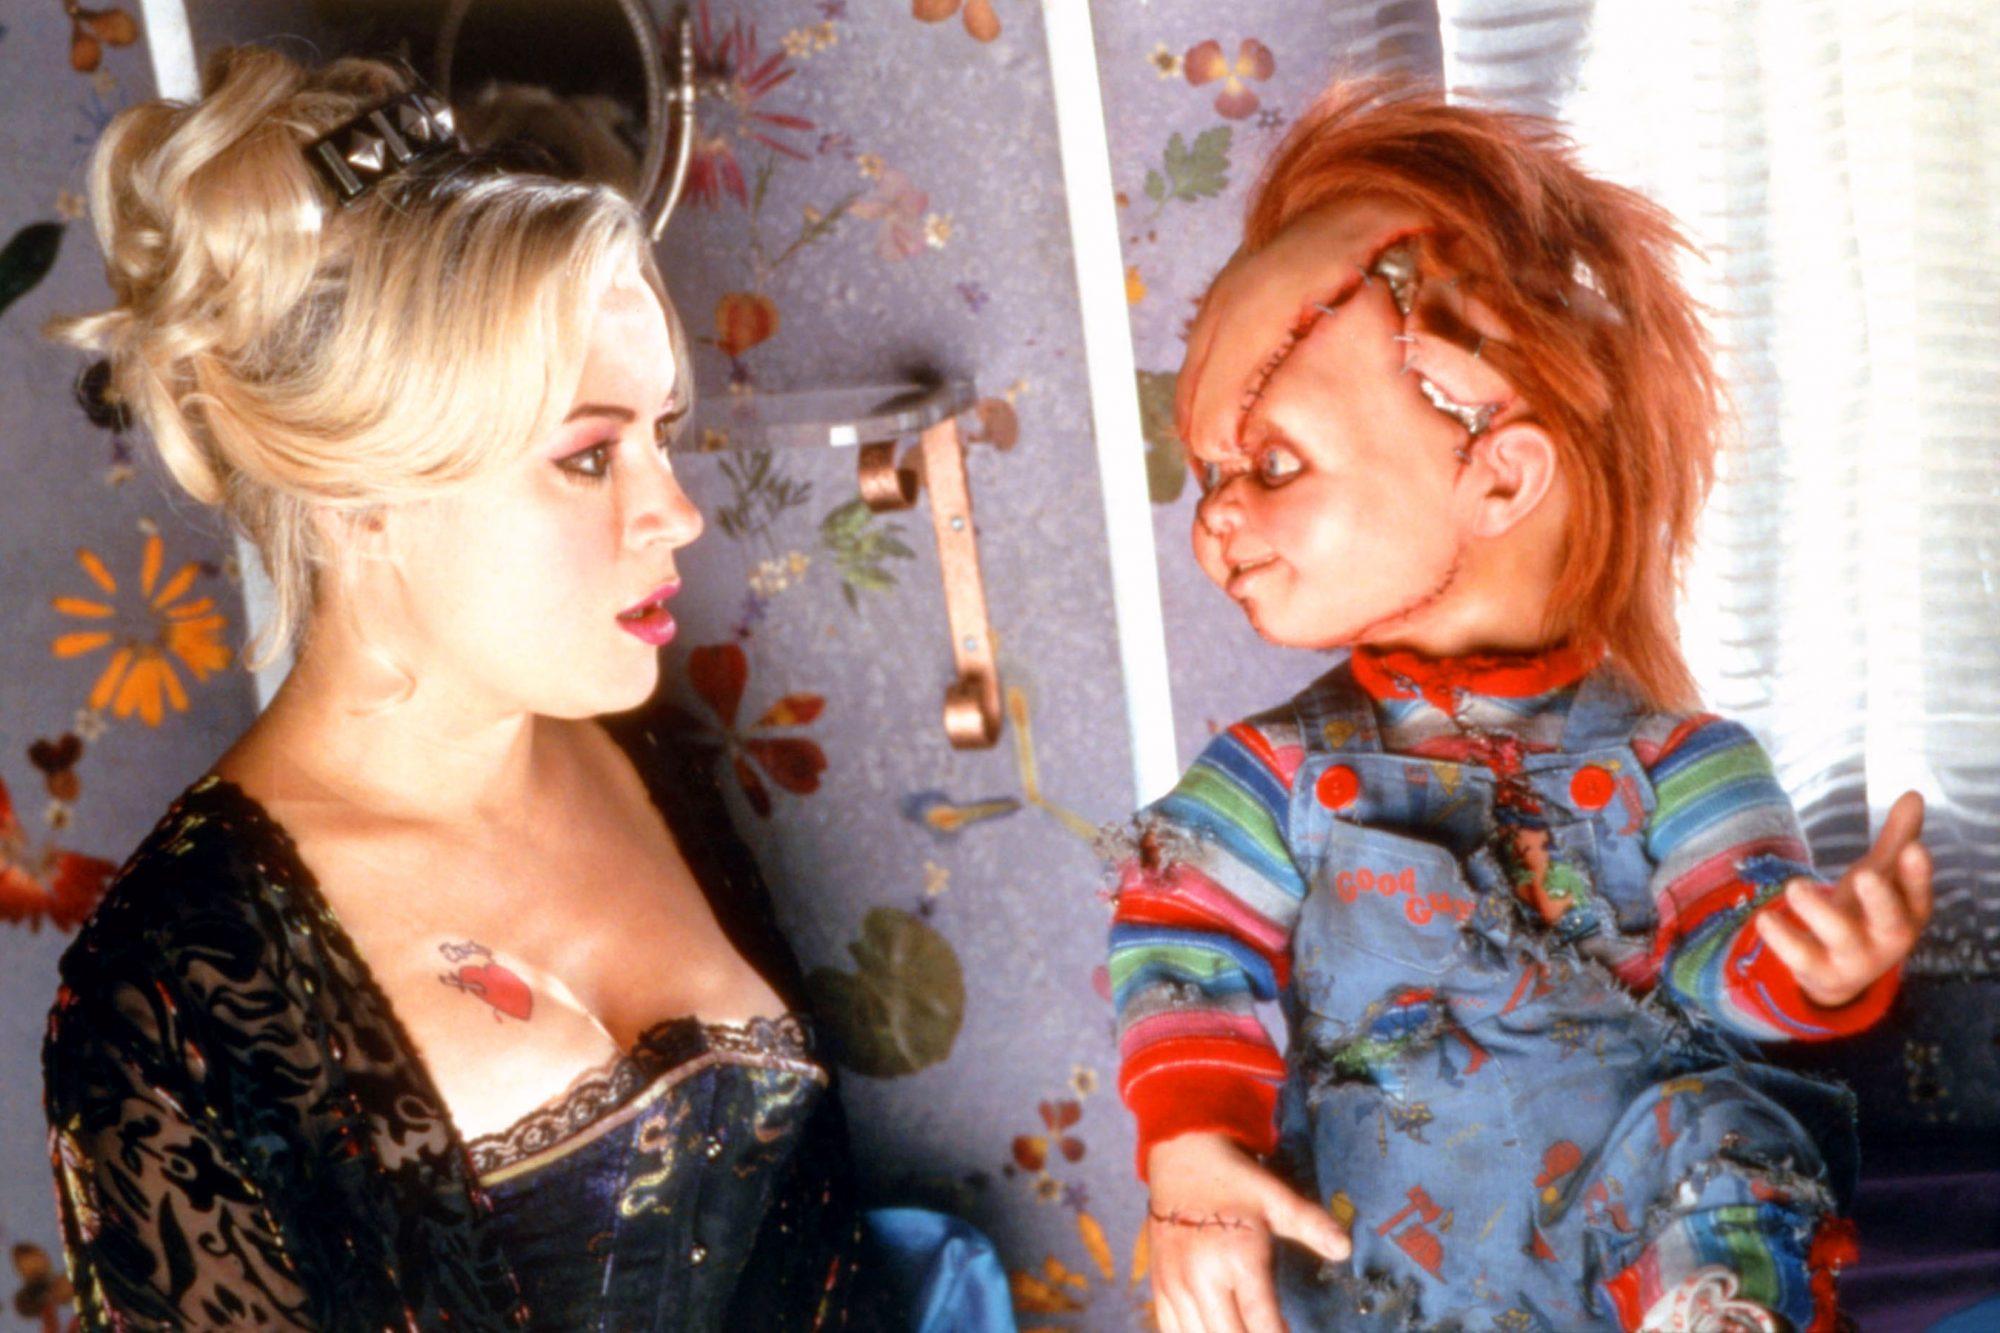 BRIDE OF CHUCKY, Jennifer Tilly, Chucky, 1998, (c)MCA Universal/courtesy Everett Collection